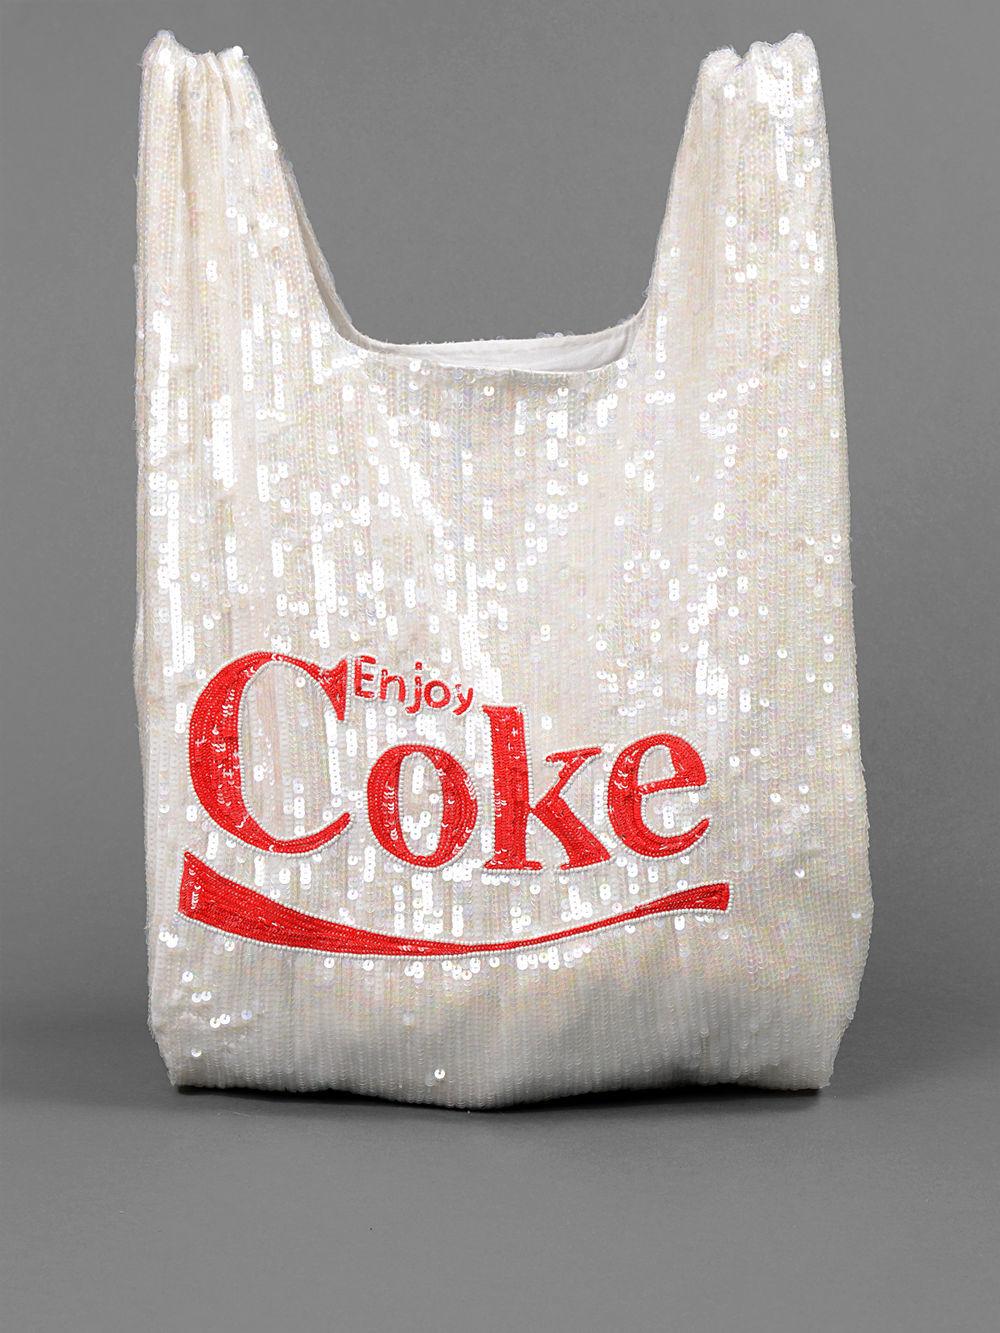 "ASHISH ""ENJOY COKE"" GROCERY BAG                                                        PRICE € 330   You can get it here >>   ASHISH  << Click"